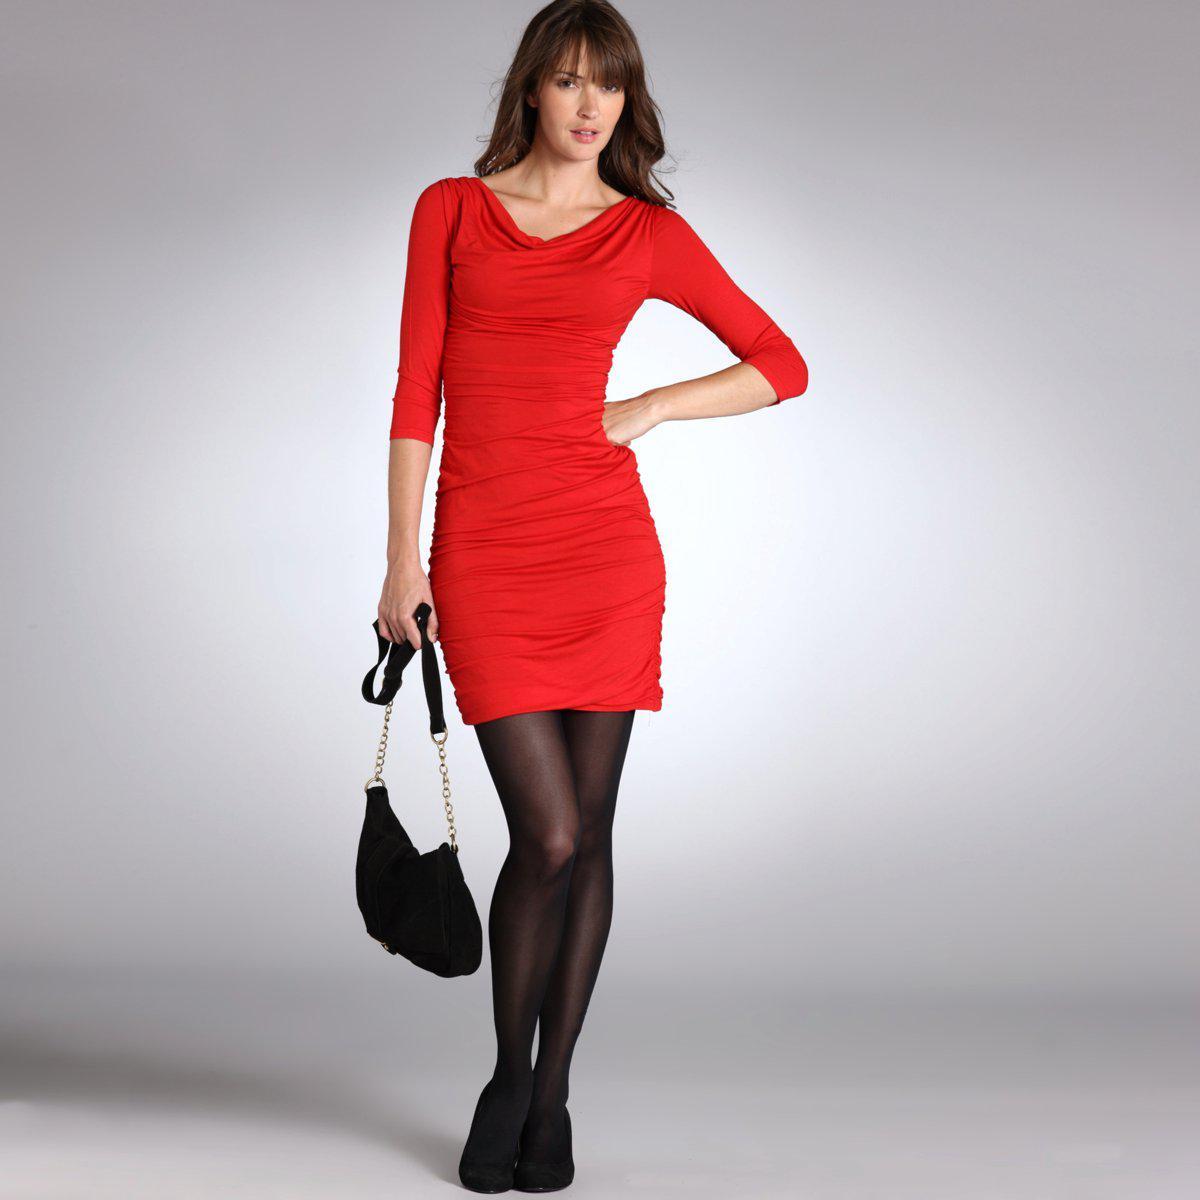 89c12d78183c Βραδυνα Φορεματα LaRedoute Χειμώνας 2012 Κωδ. 324202991